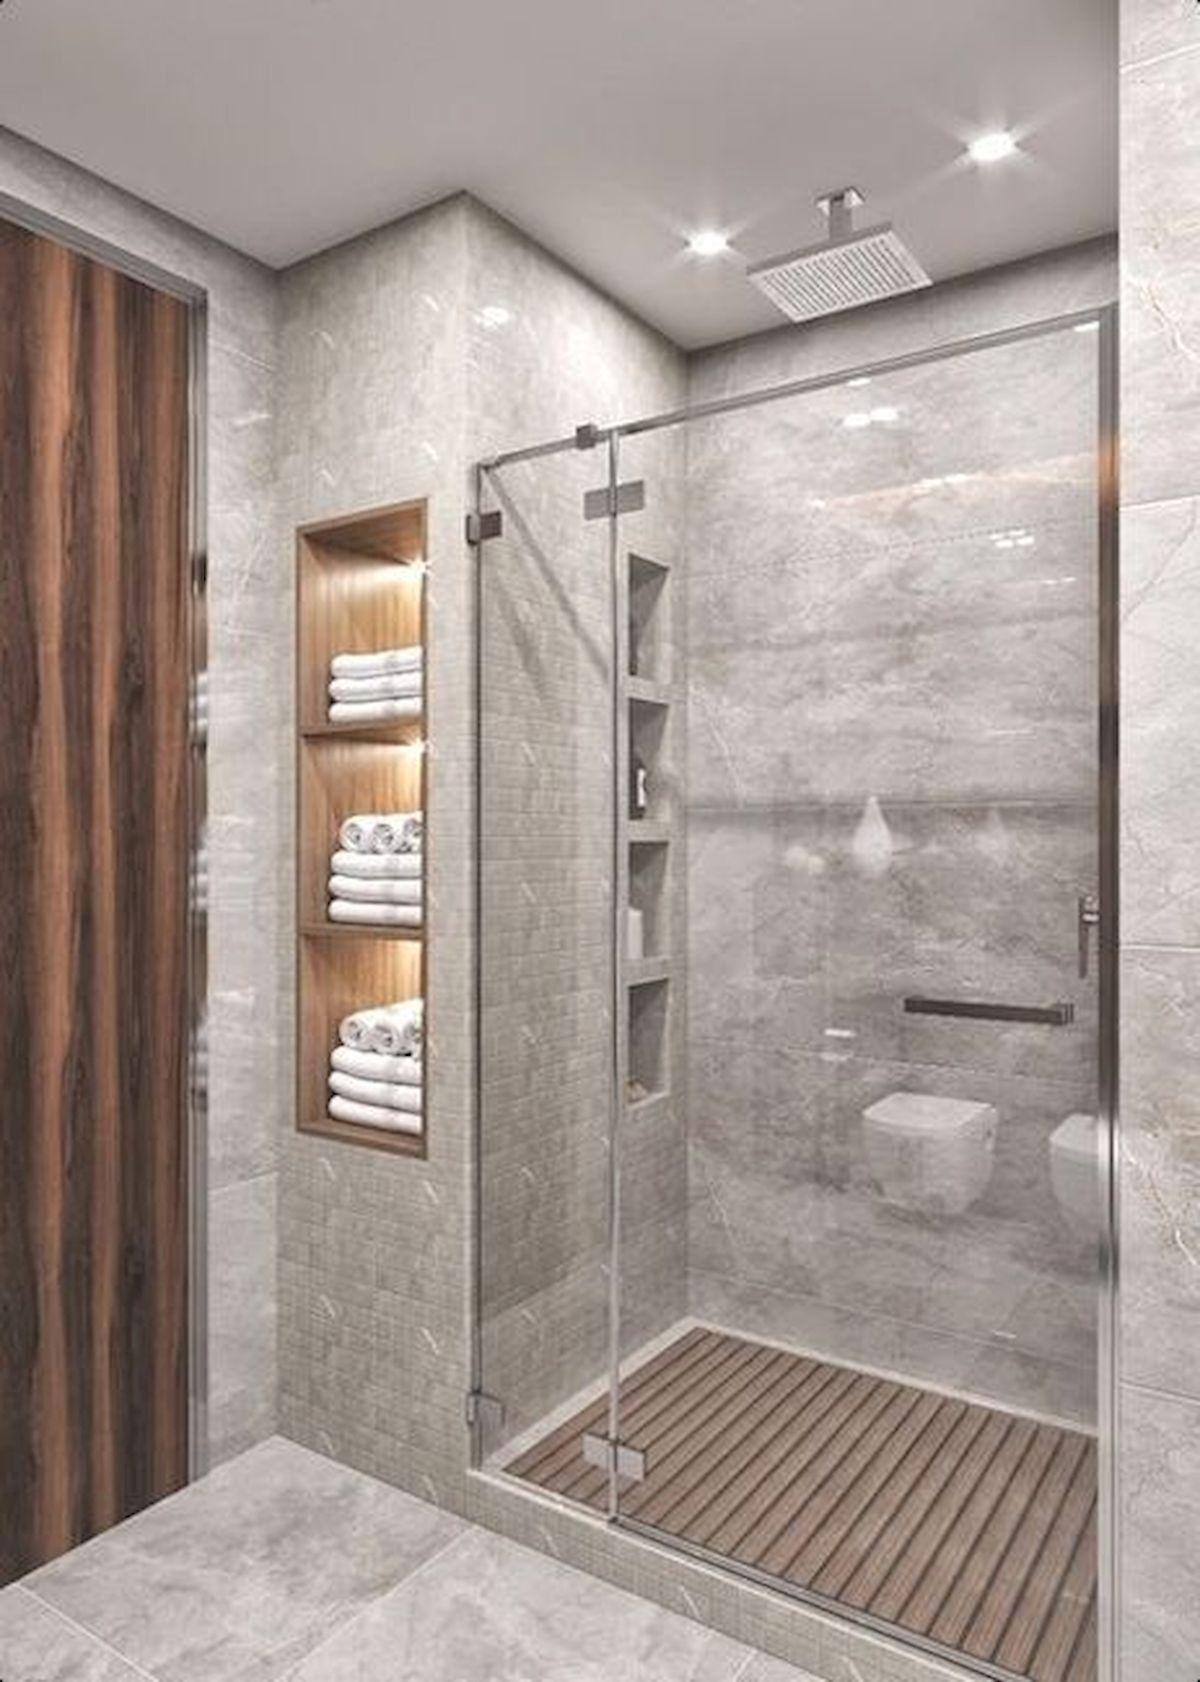 Unique Bathroom Ideas Small Modern Image By Diminutive Details On Bathroom Ideas In 2020 Modern Master Bathroom Master Bathroom Design Small Master Bathroom